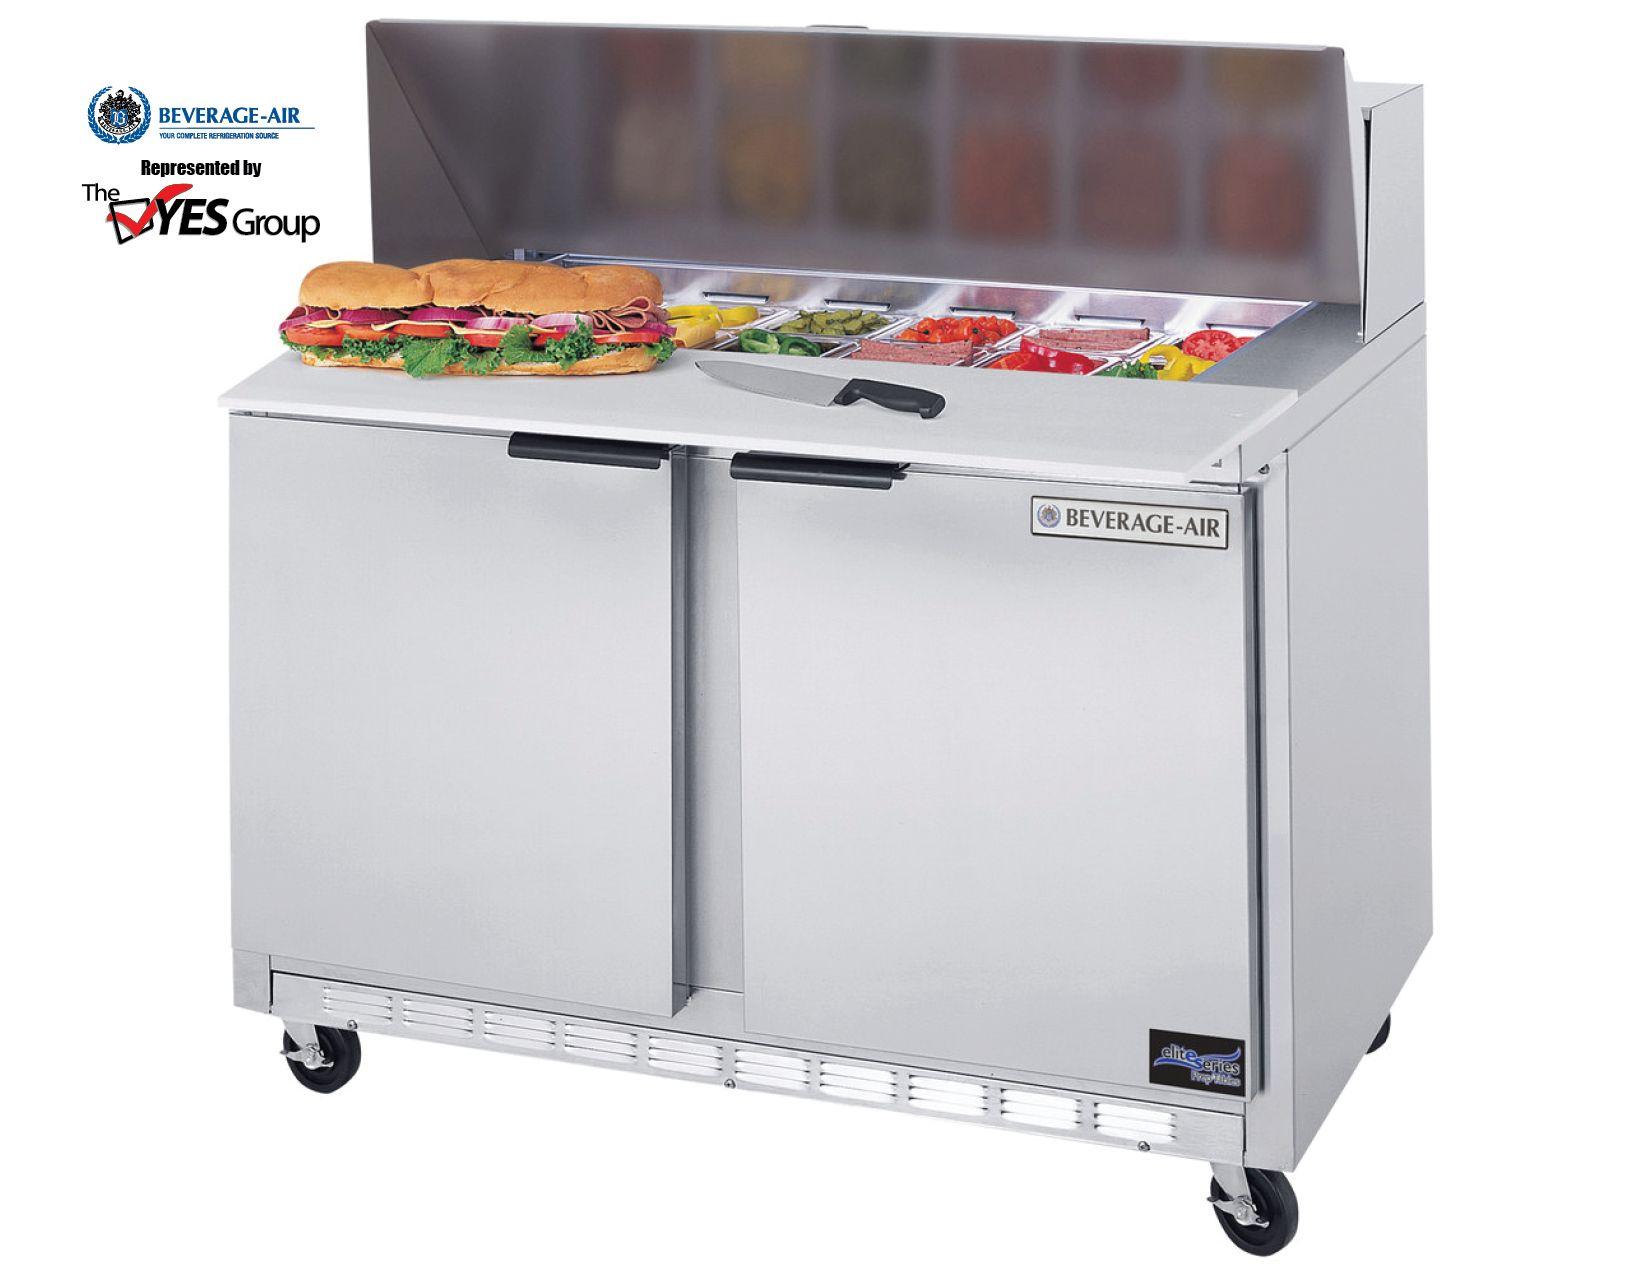 Sandwich Prep Table Elite Series By BeverageAir Coolers Pinterest - Sandwich prep table cooler